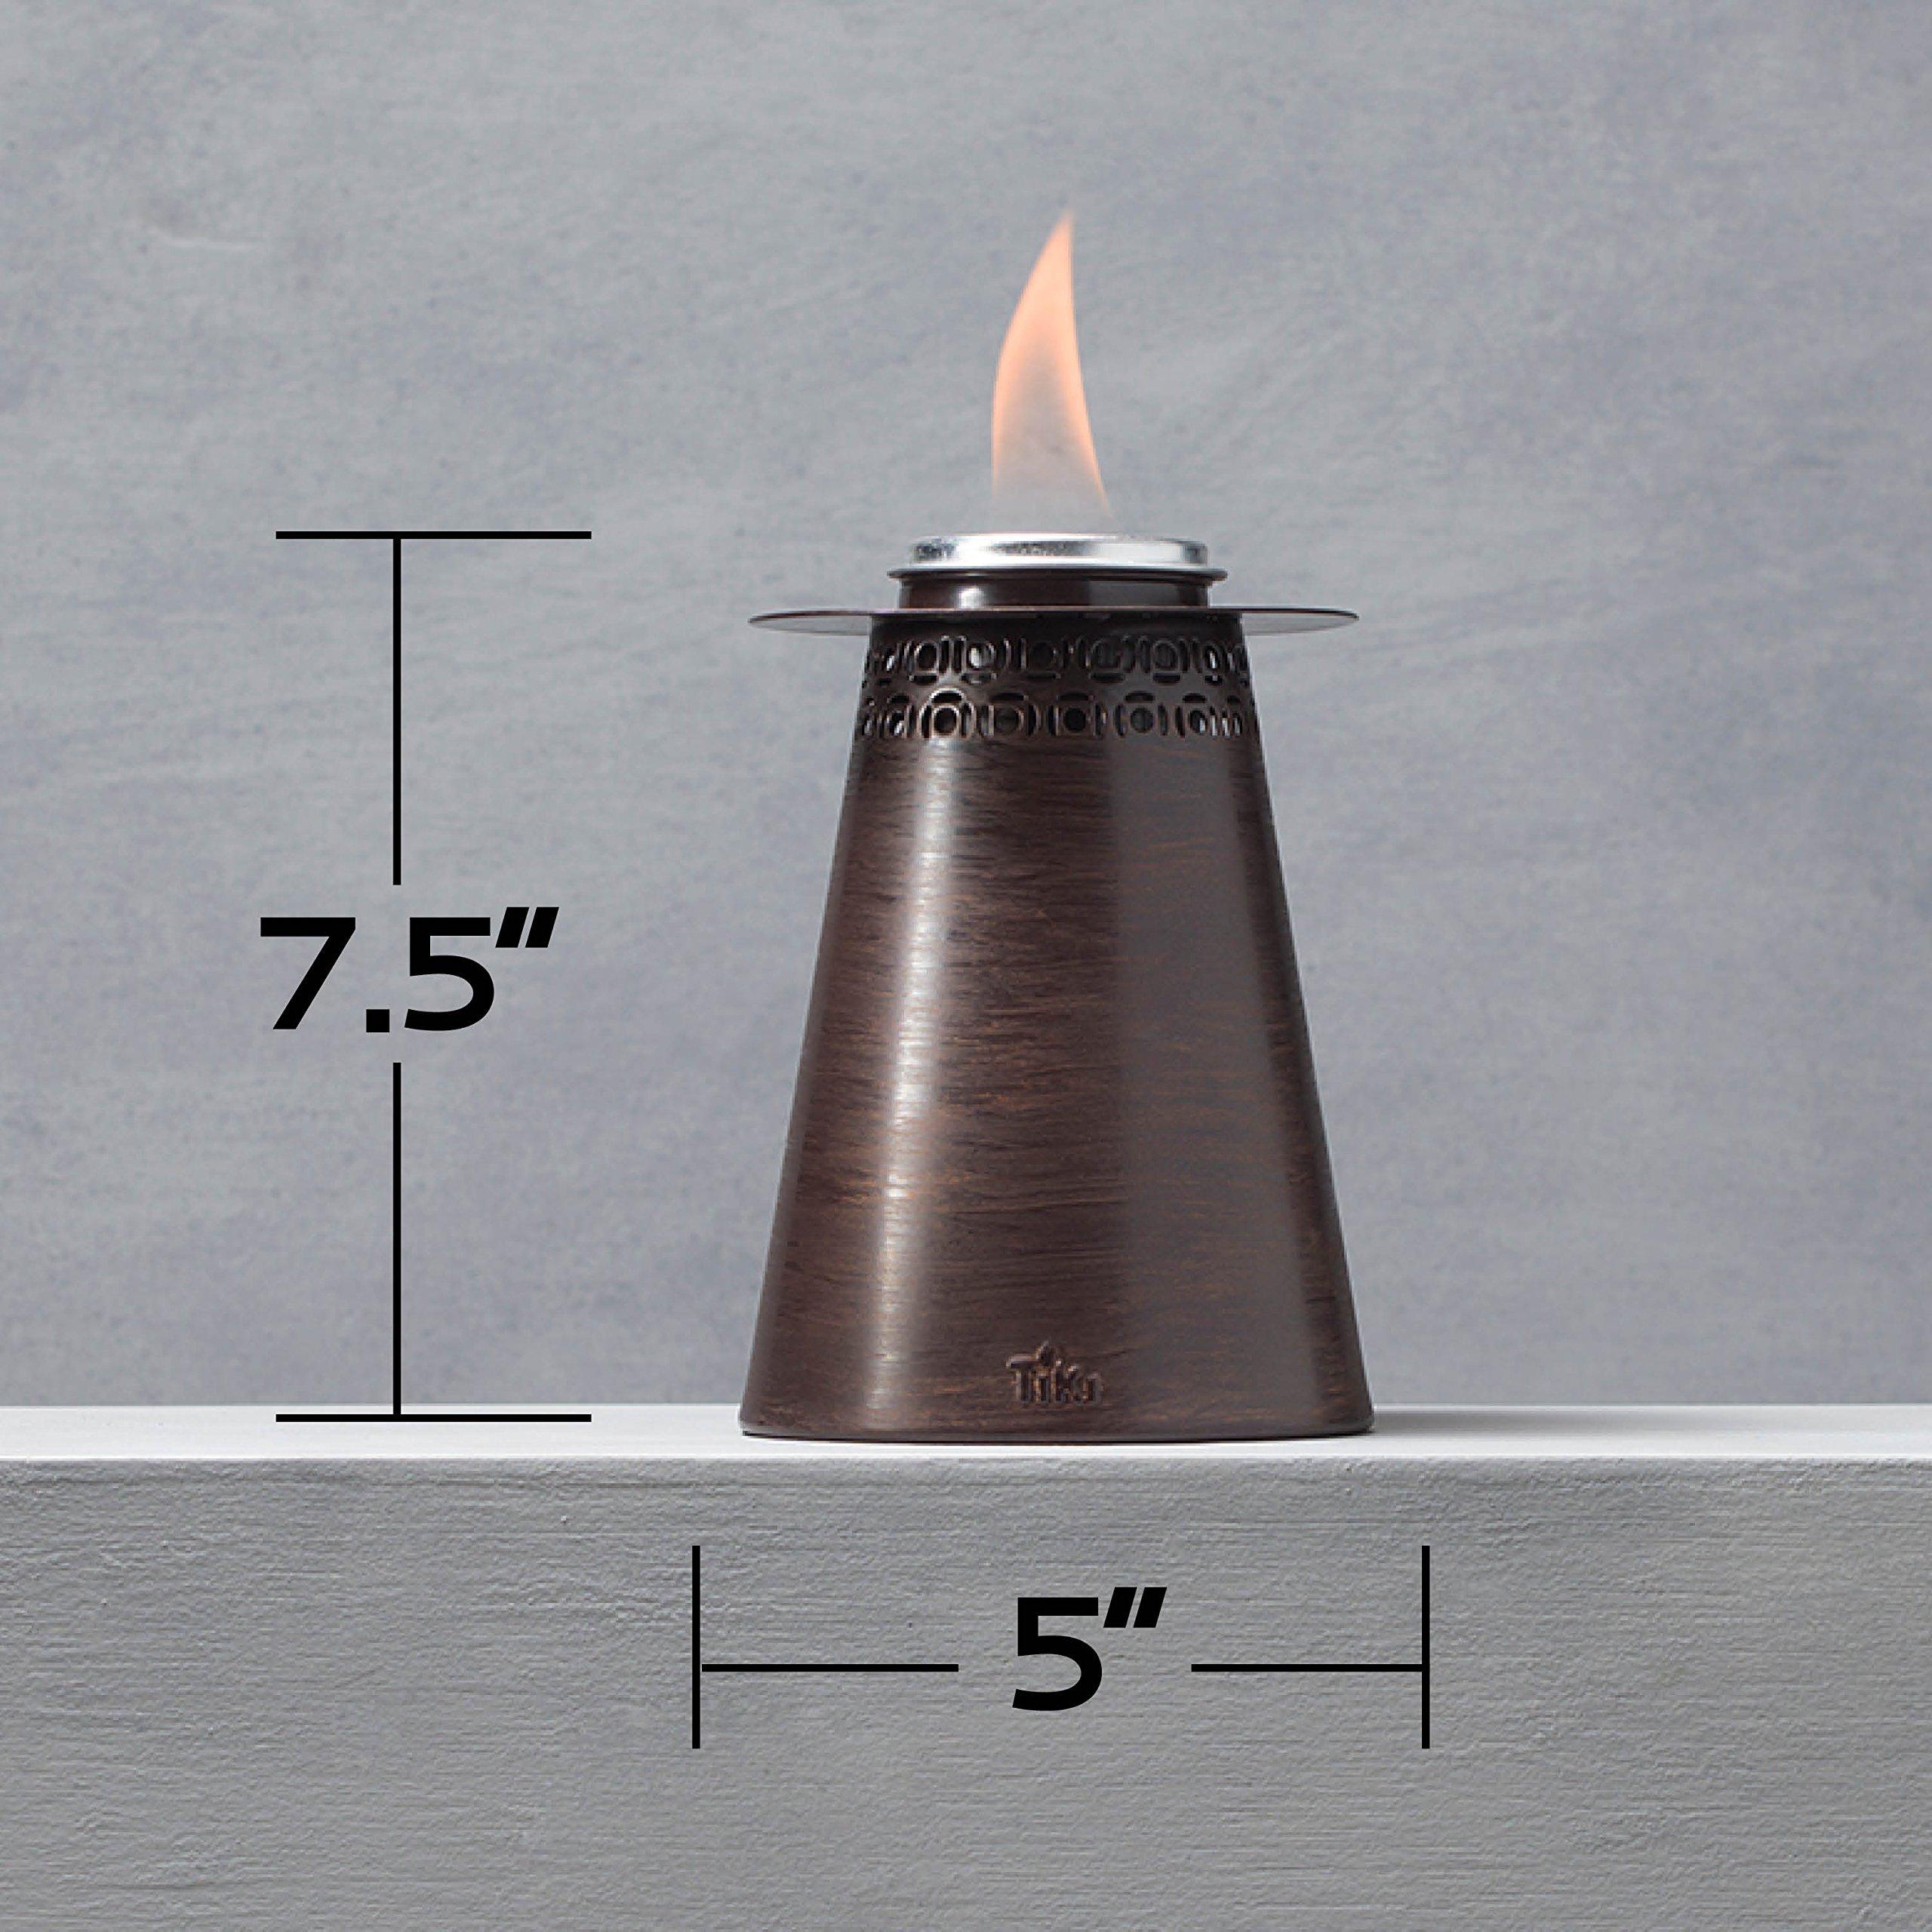 TIKI Brand 7.5-Inch Clean Burn Fire Pillar Metal Table Torch, Copper 3-Pack